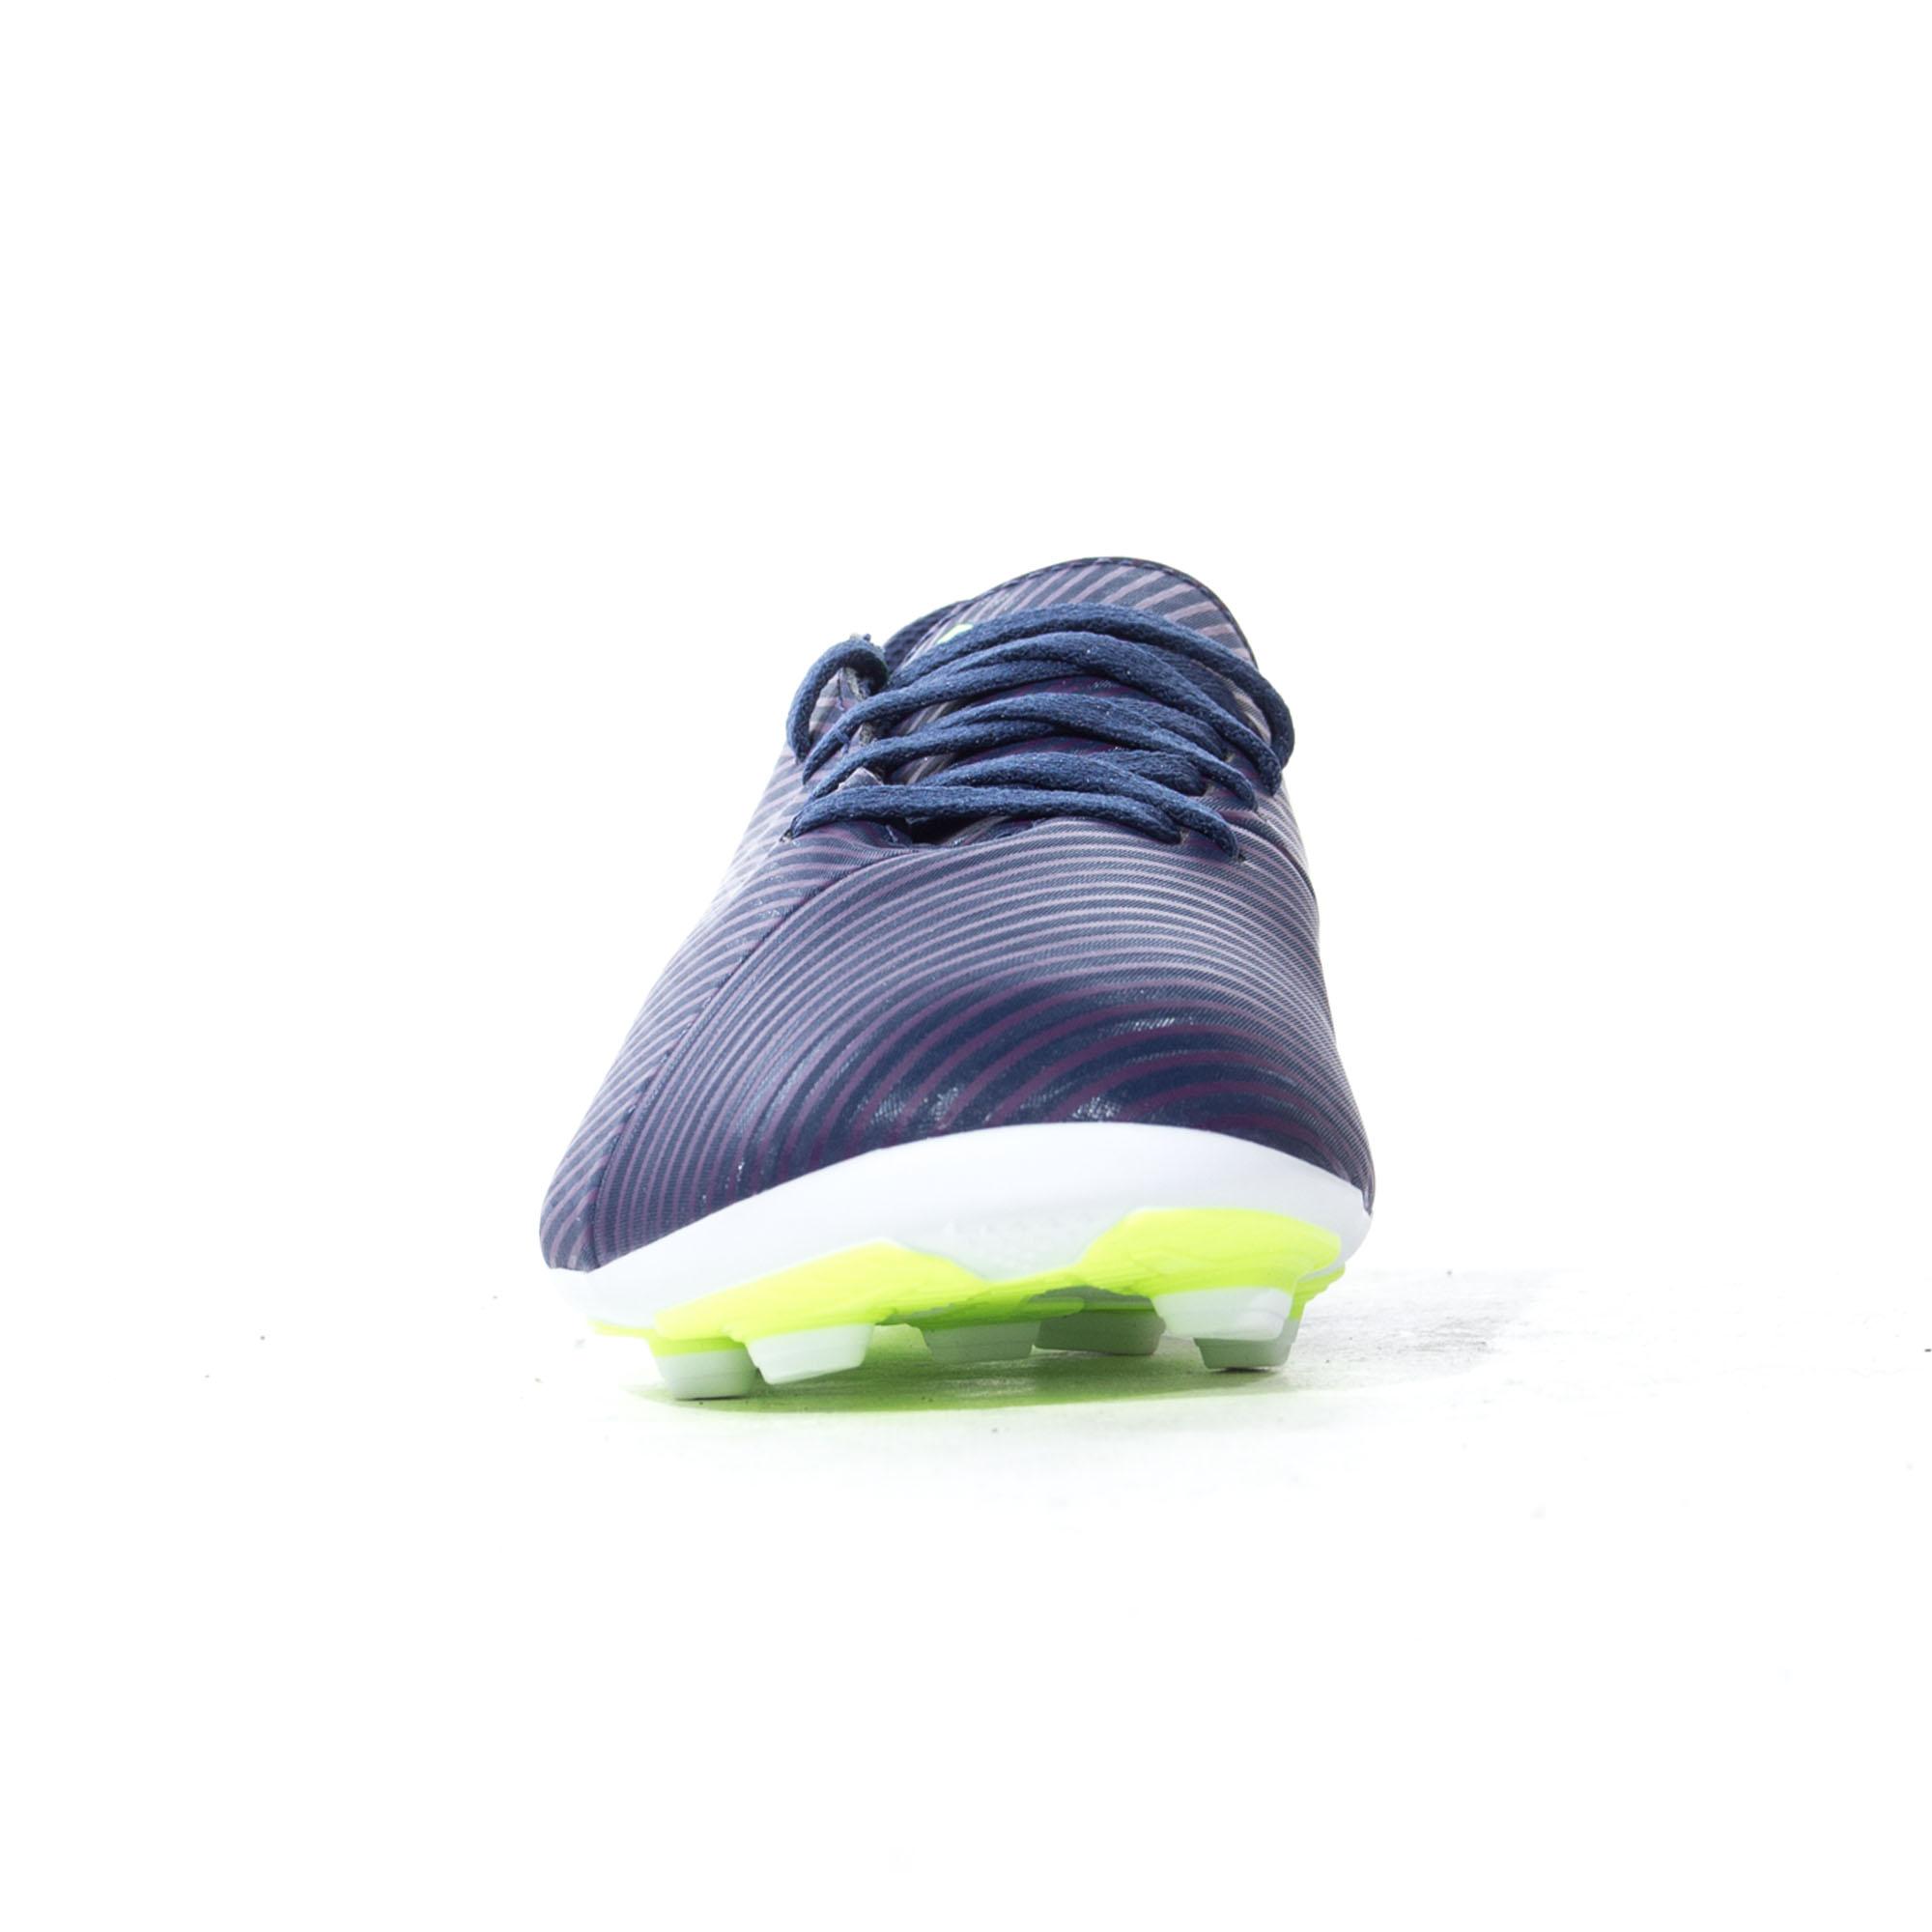 Adidas-nemeziz-Messi-19-4-FXG-Terre-Ferme-Enfants-Football-Soccer-Boot-Purple miniature 9